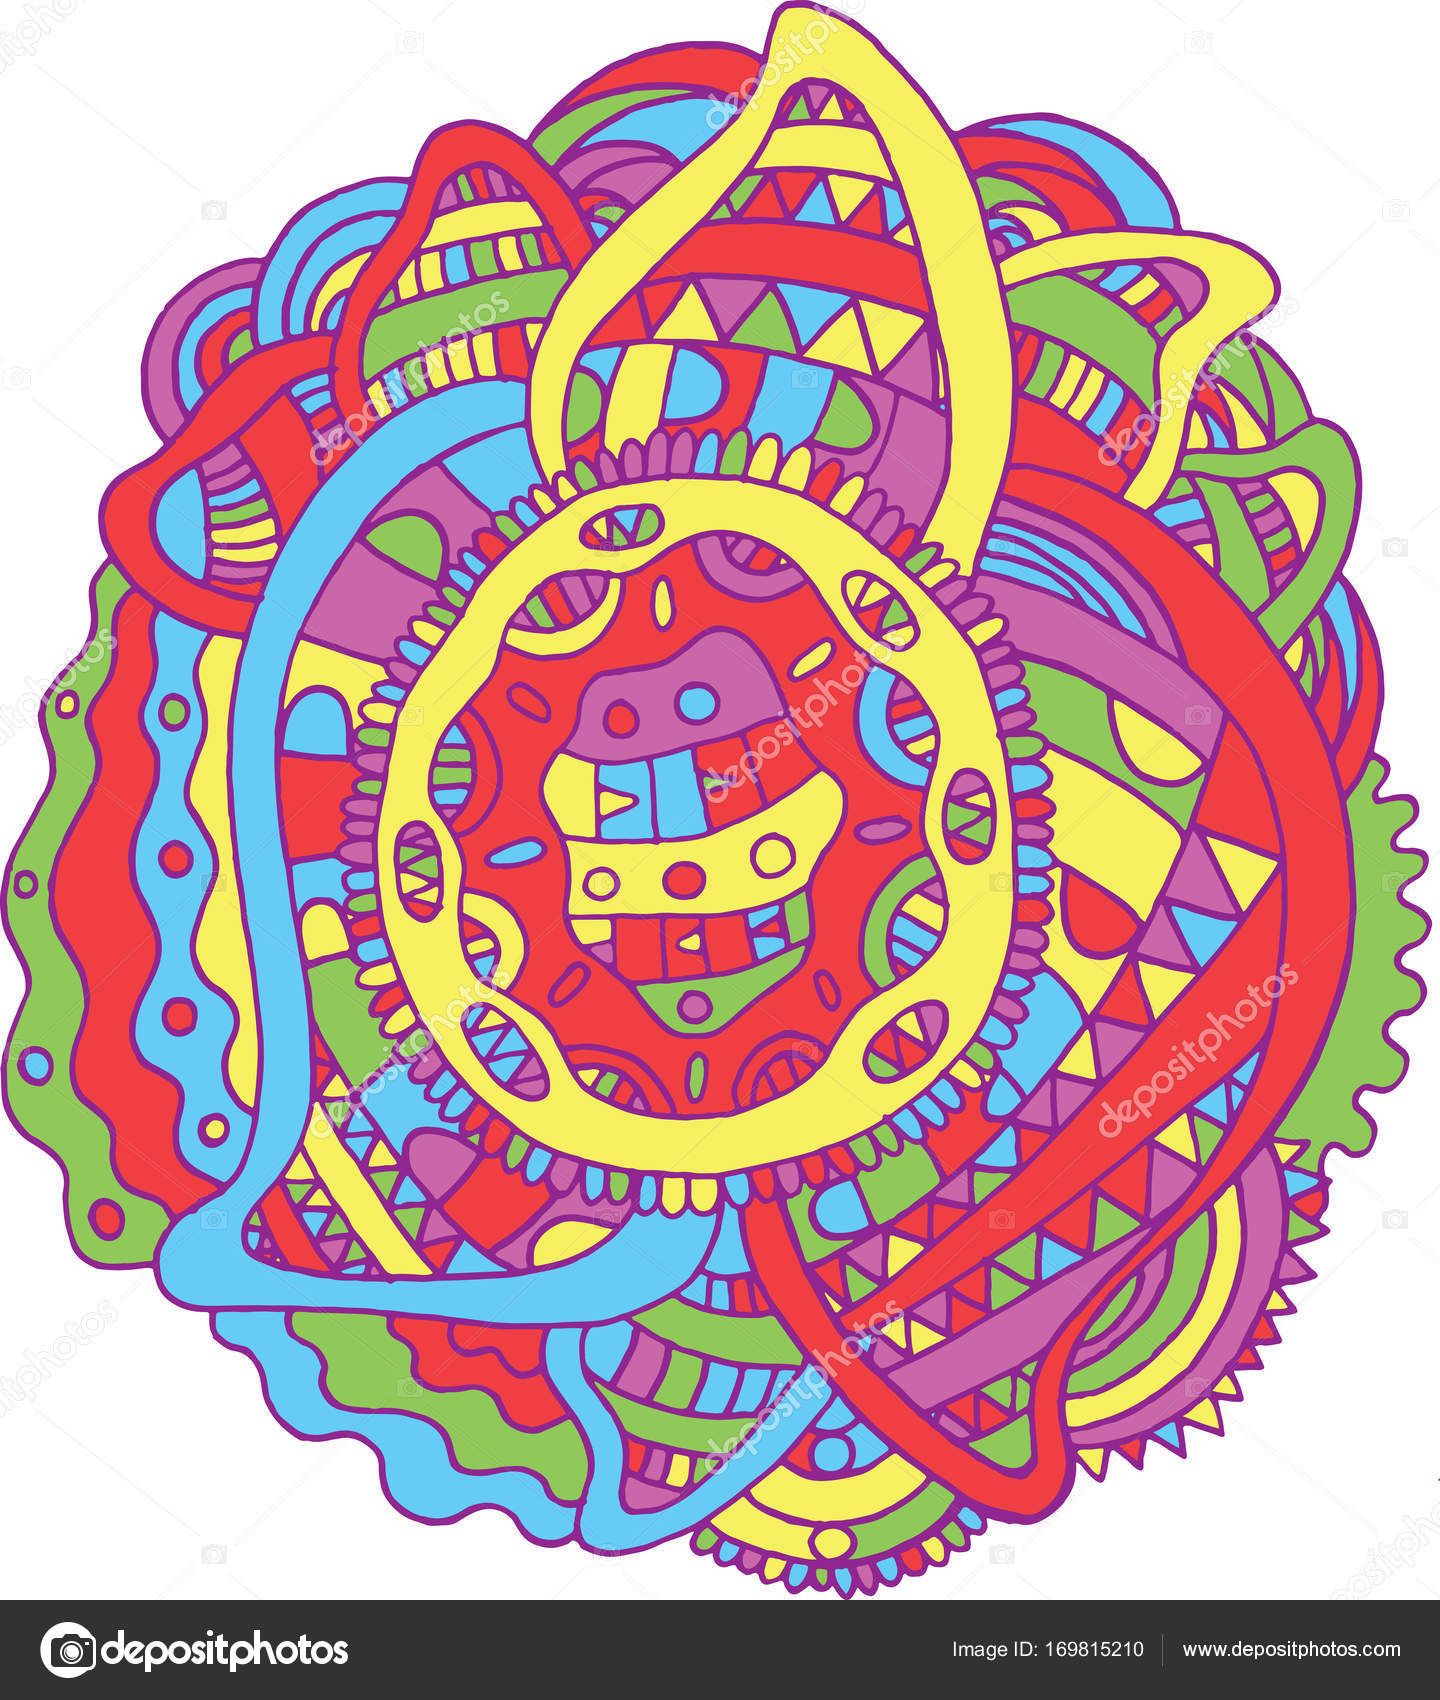 Doodle Mandala - Malvorlagen für Erwachsene. Meditative Boho carto ...